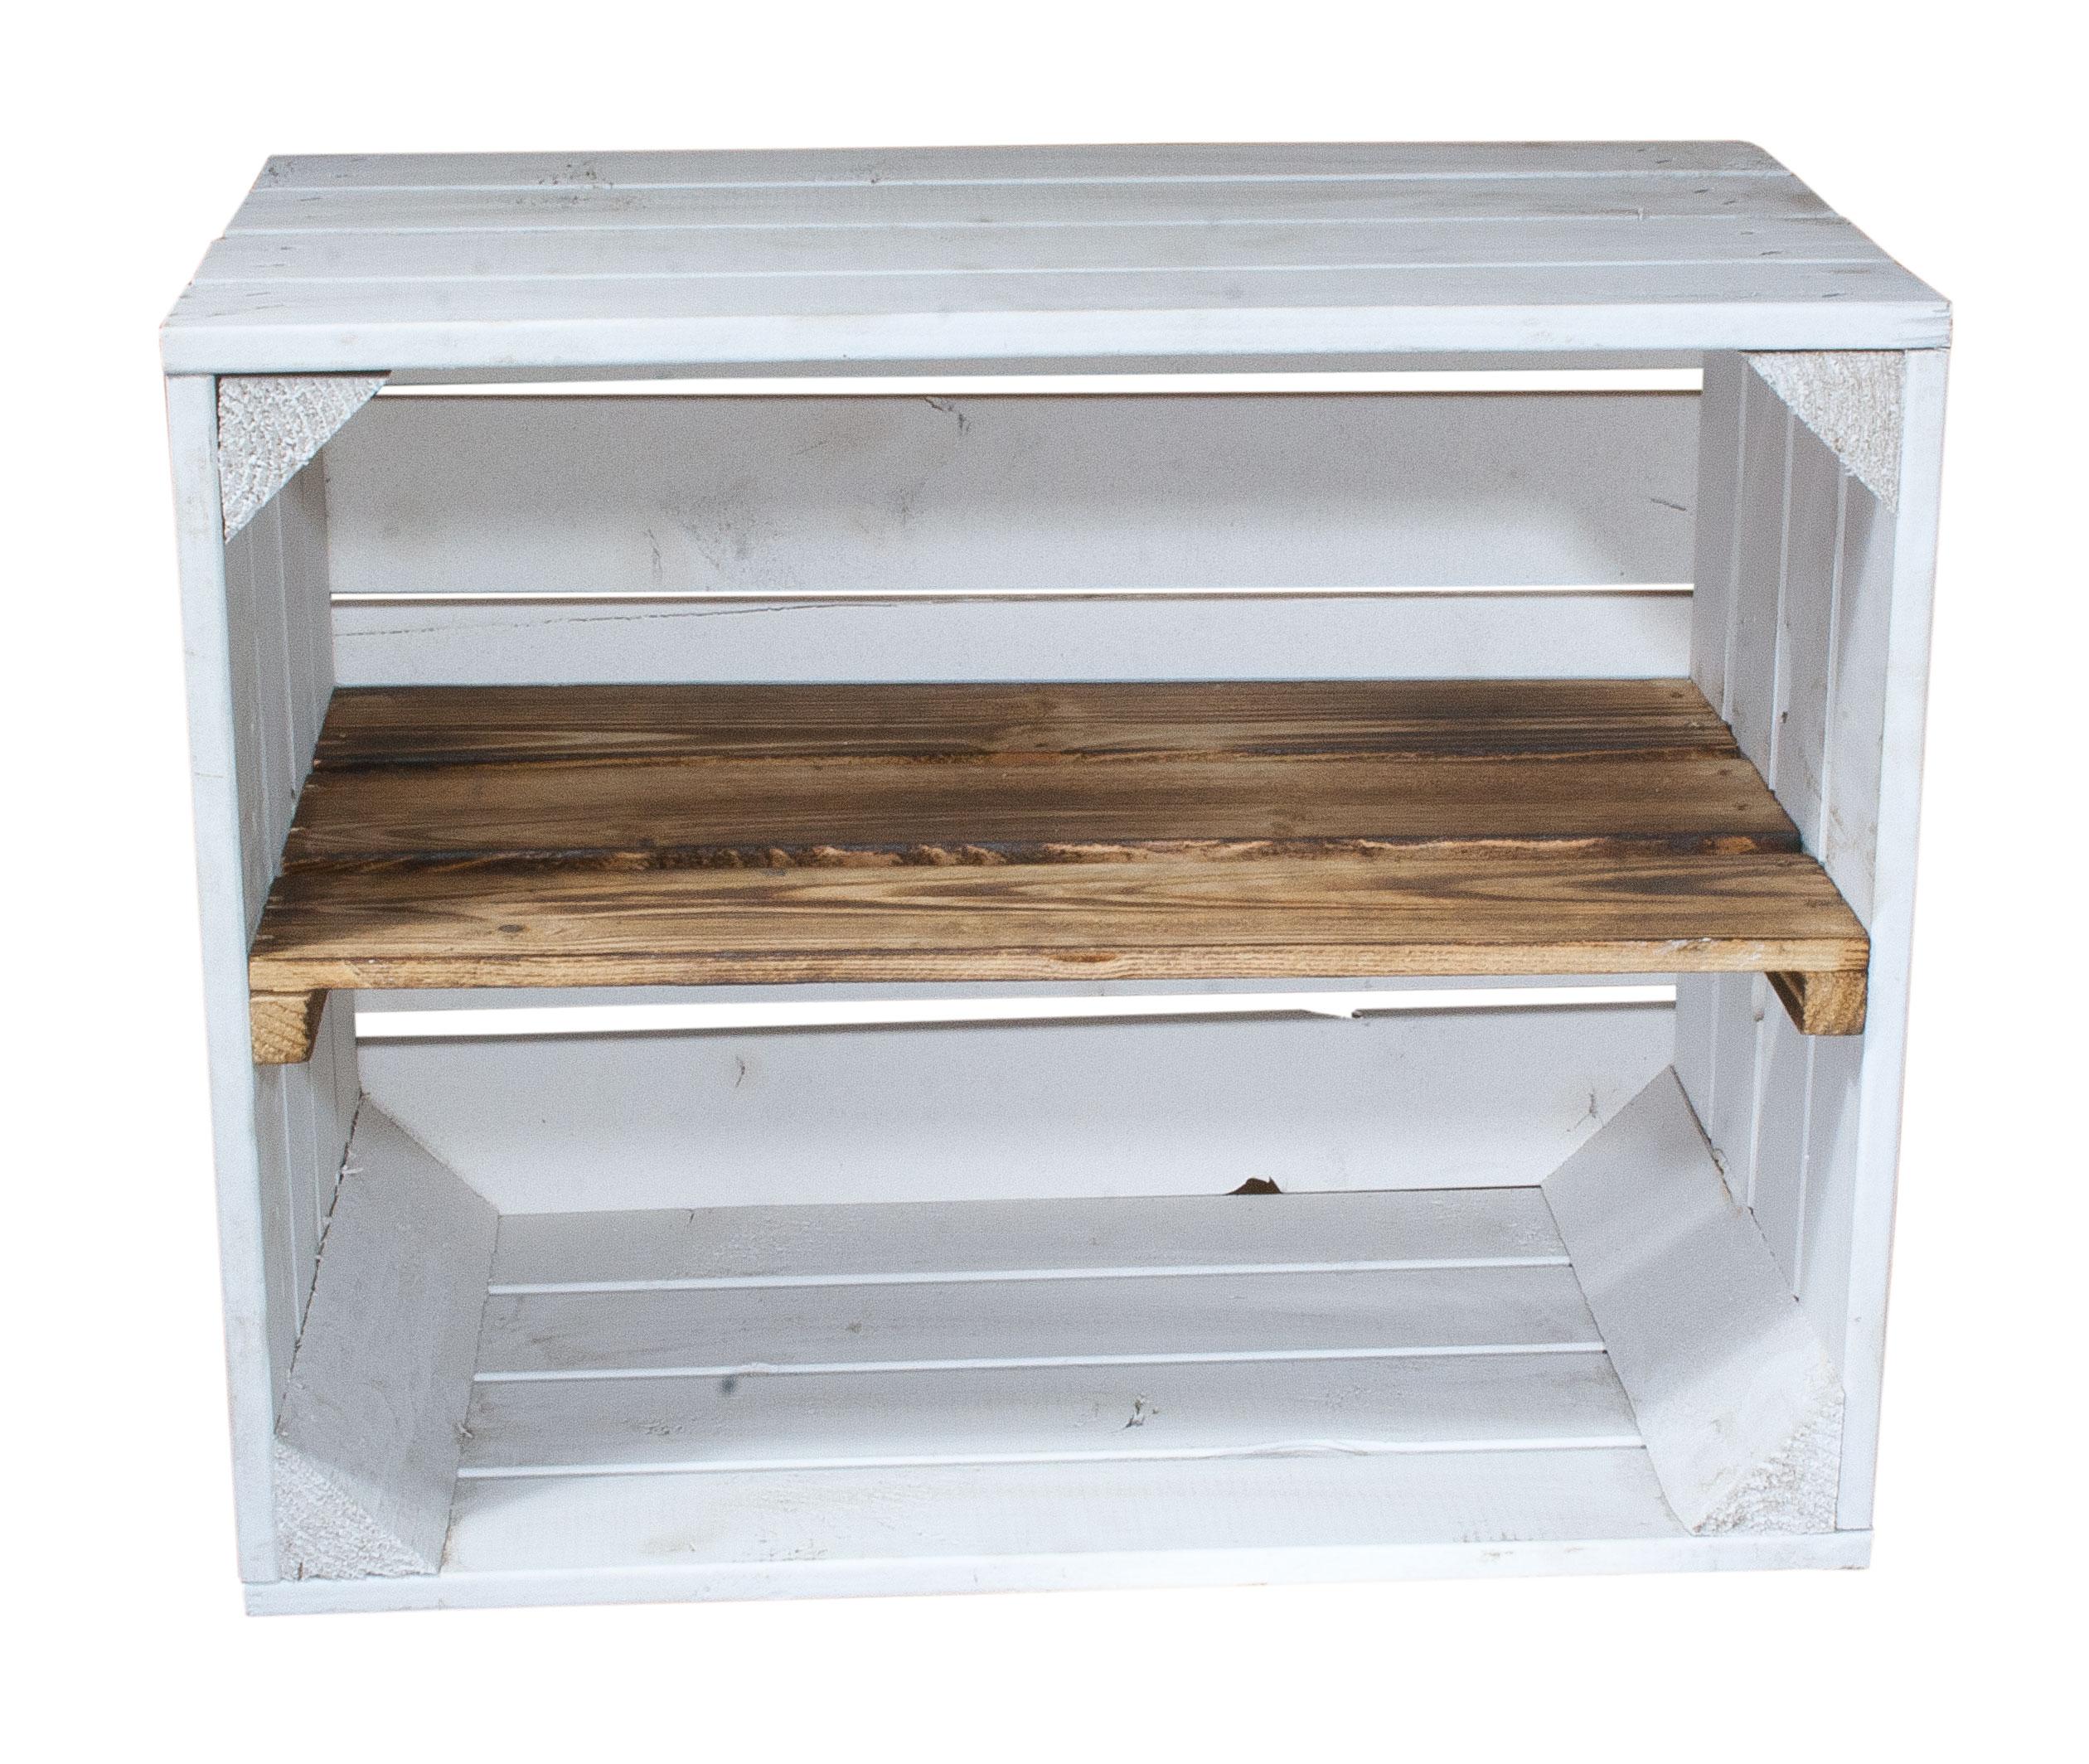 bestseller wei e holzkiste mit geflammtem mittelbrett l ngst 50x40x30cm. Black Bedroom Furniture Sets. Home Design Ideas